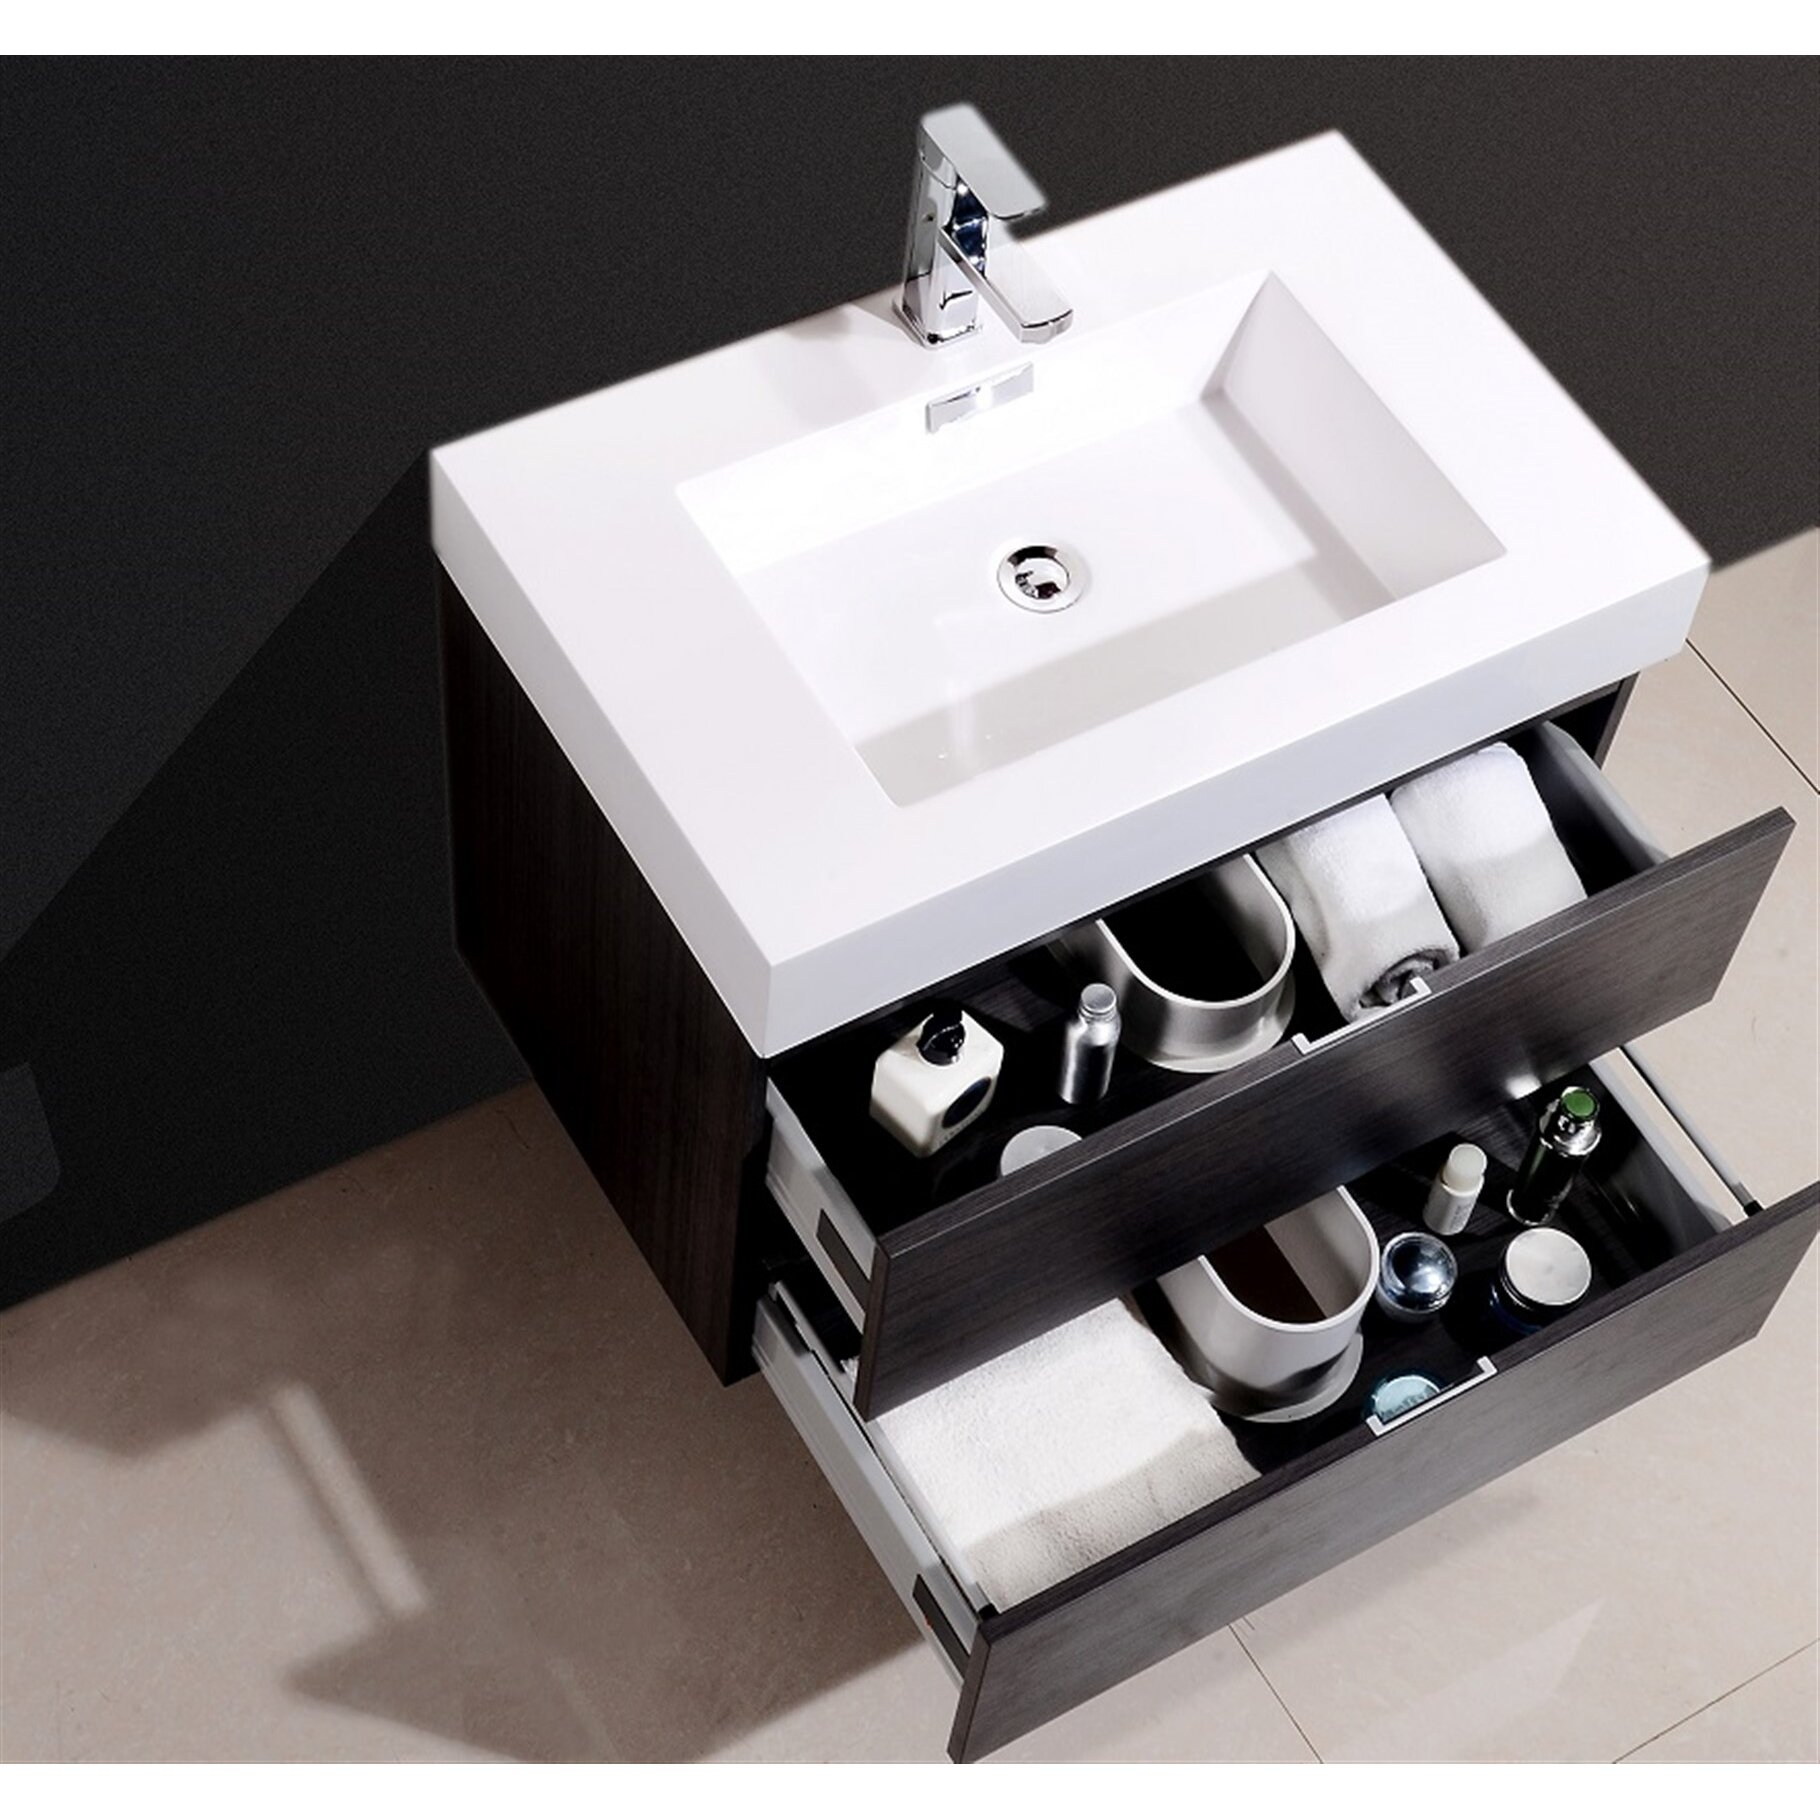 Bathroom Vanities Brooklyn bathroom vanities brooklyn ny ~ instavanity